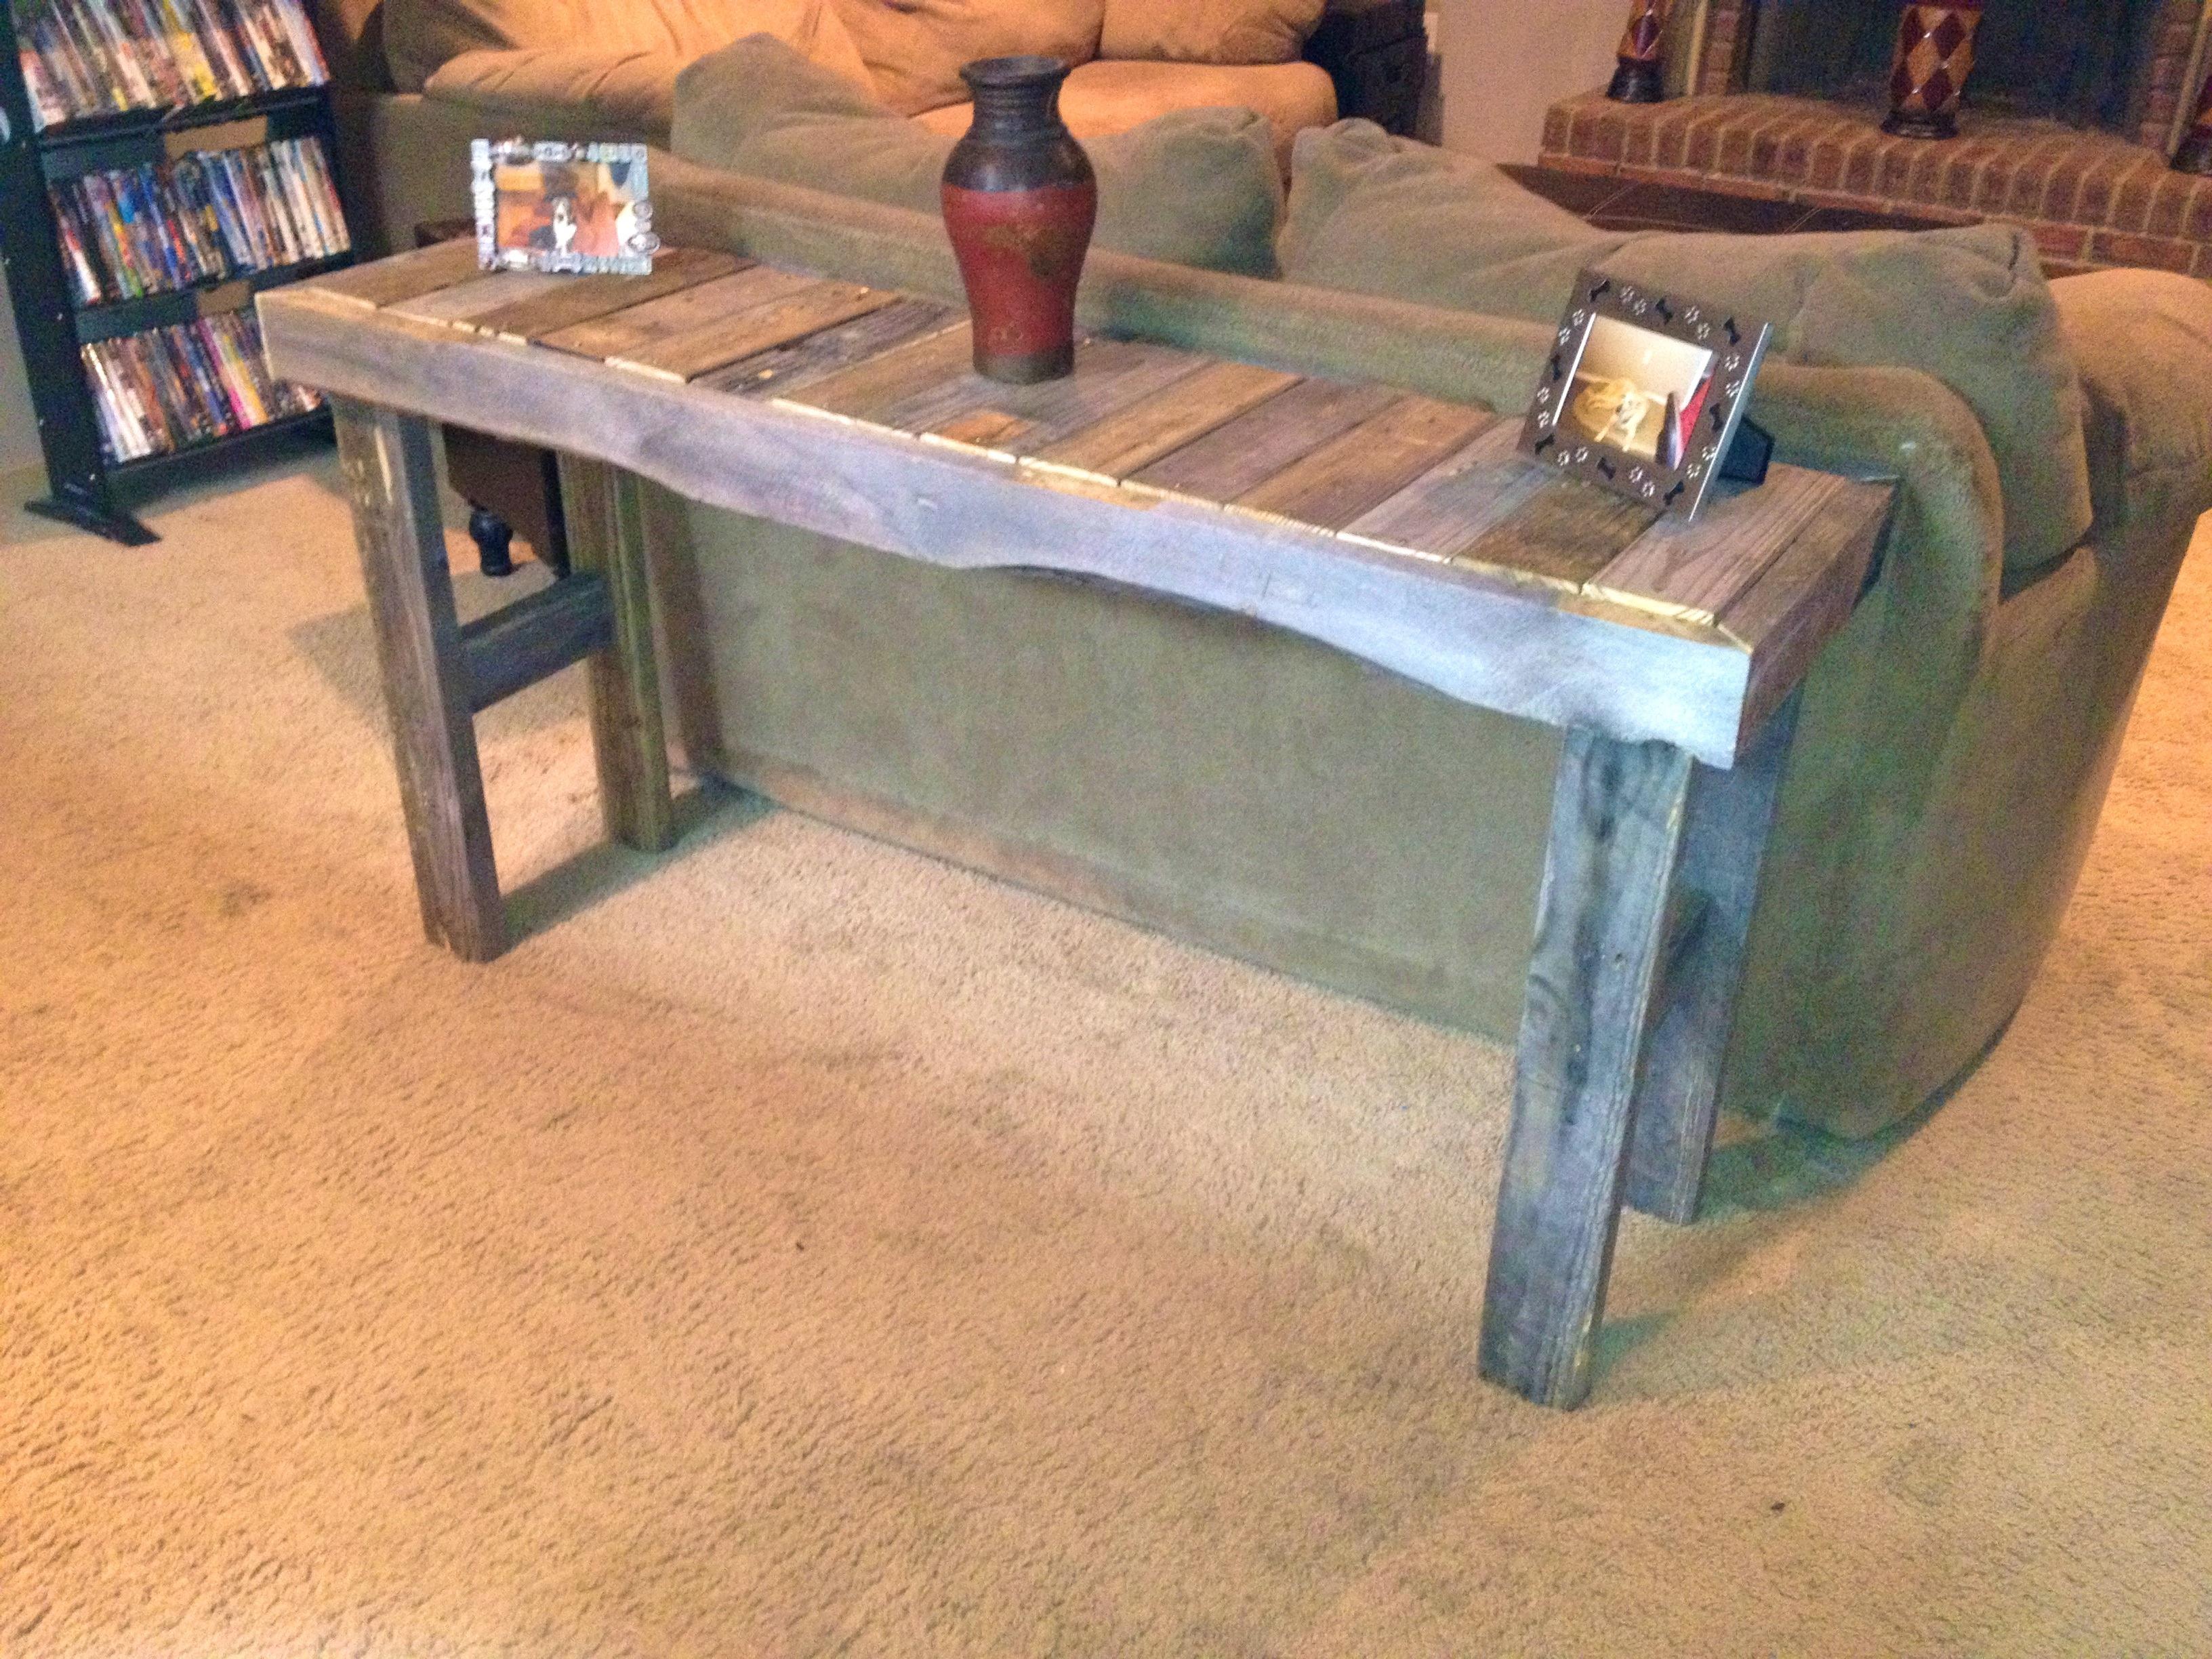 Shabby Chic Sofa Table With Design Ideas 17569   Kengire Throughout Shabby Chic Sofa Tables (View 14 of 20)